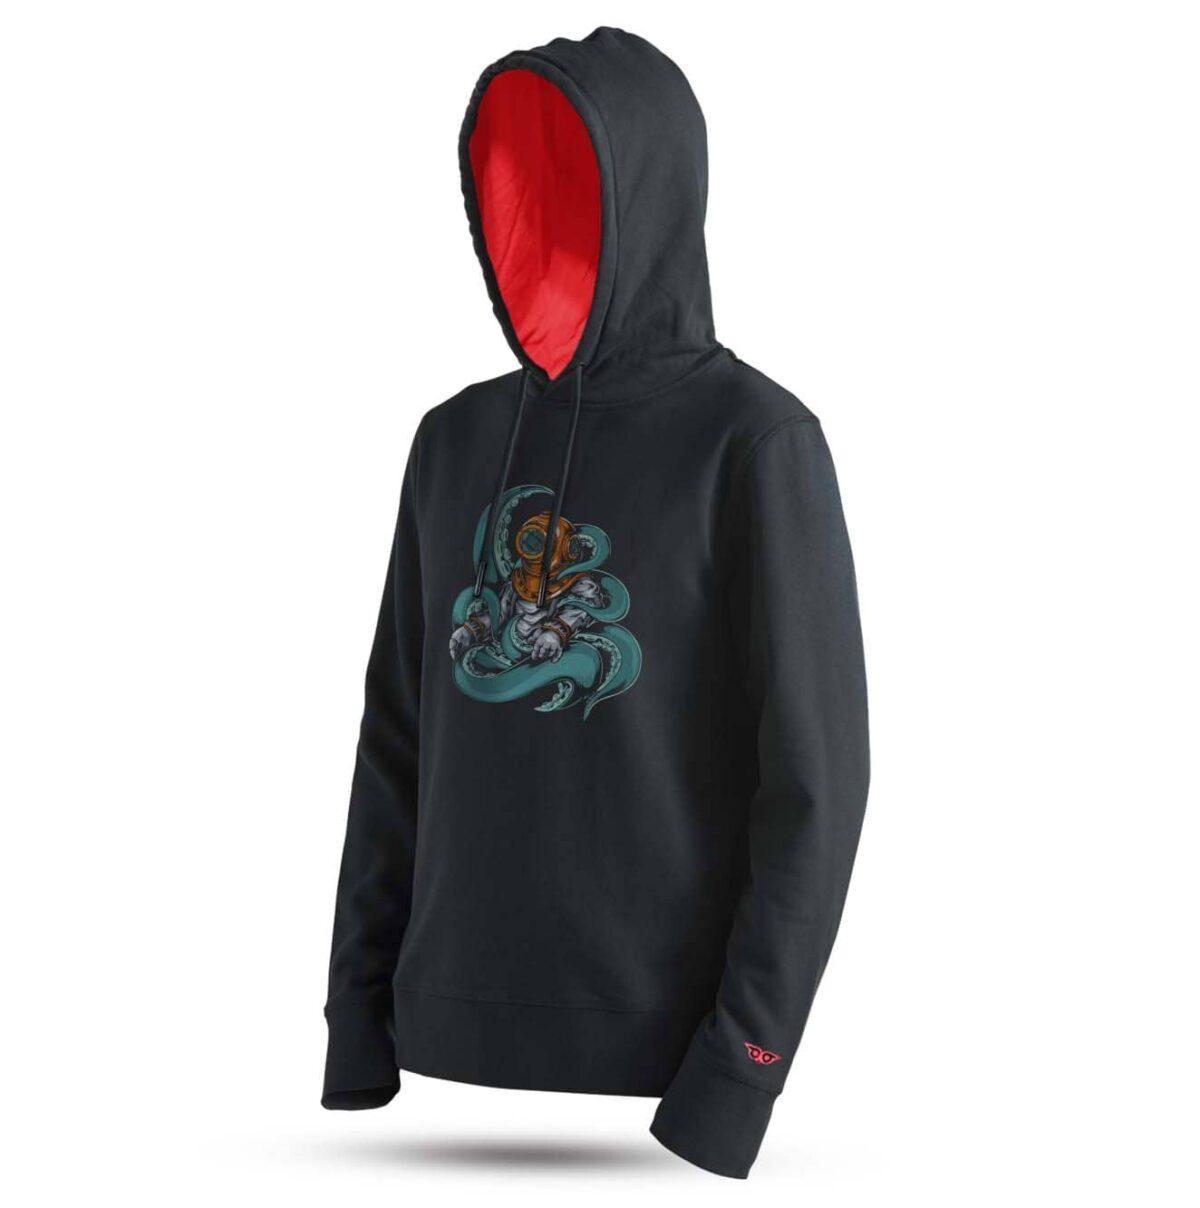 tarrzz-tasarim-kapsonlu-sweatshirt-arkeolog-dalgic-baskili-sweatshirt